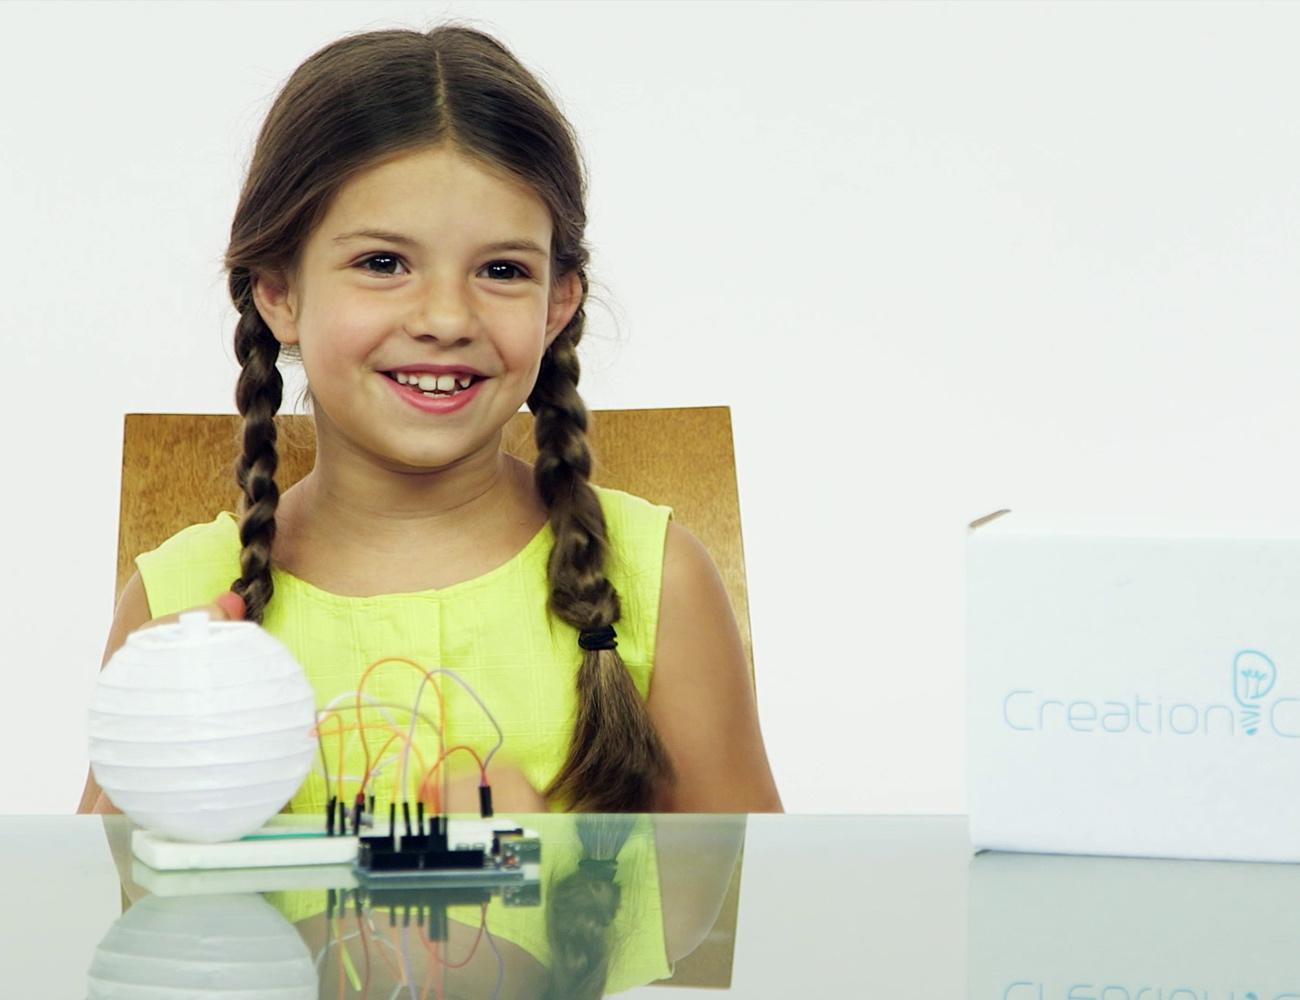 Creation Crate AR Electronics Education Platform